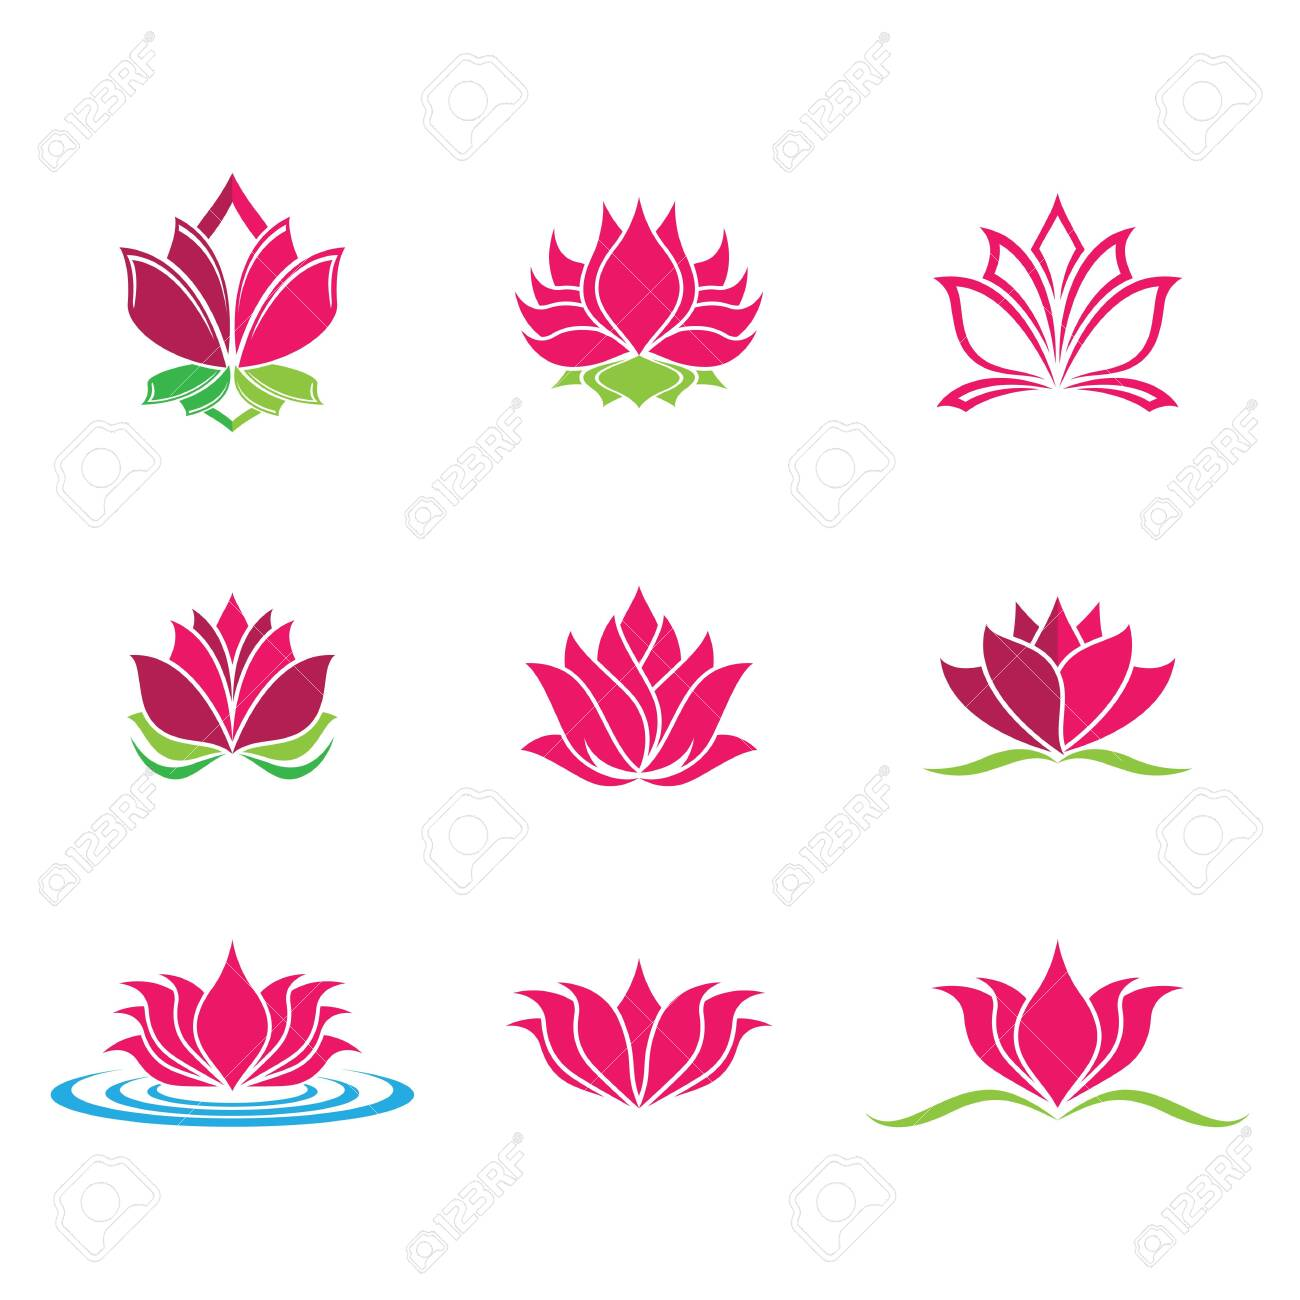 Lotus symbol vector icon illustration - 150678196